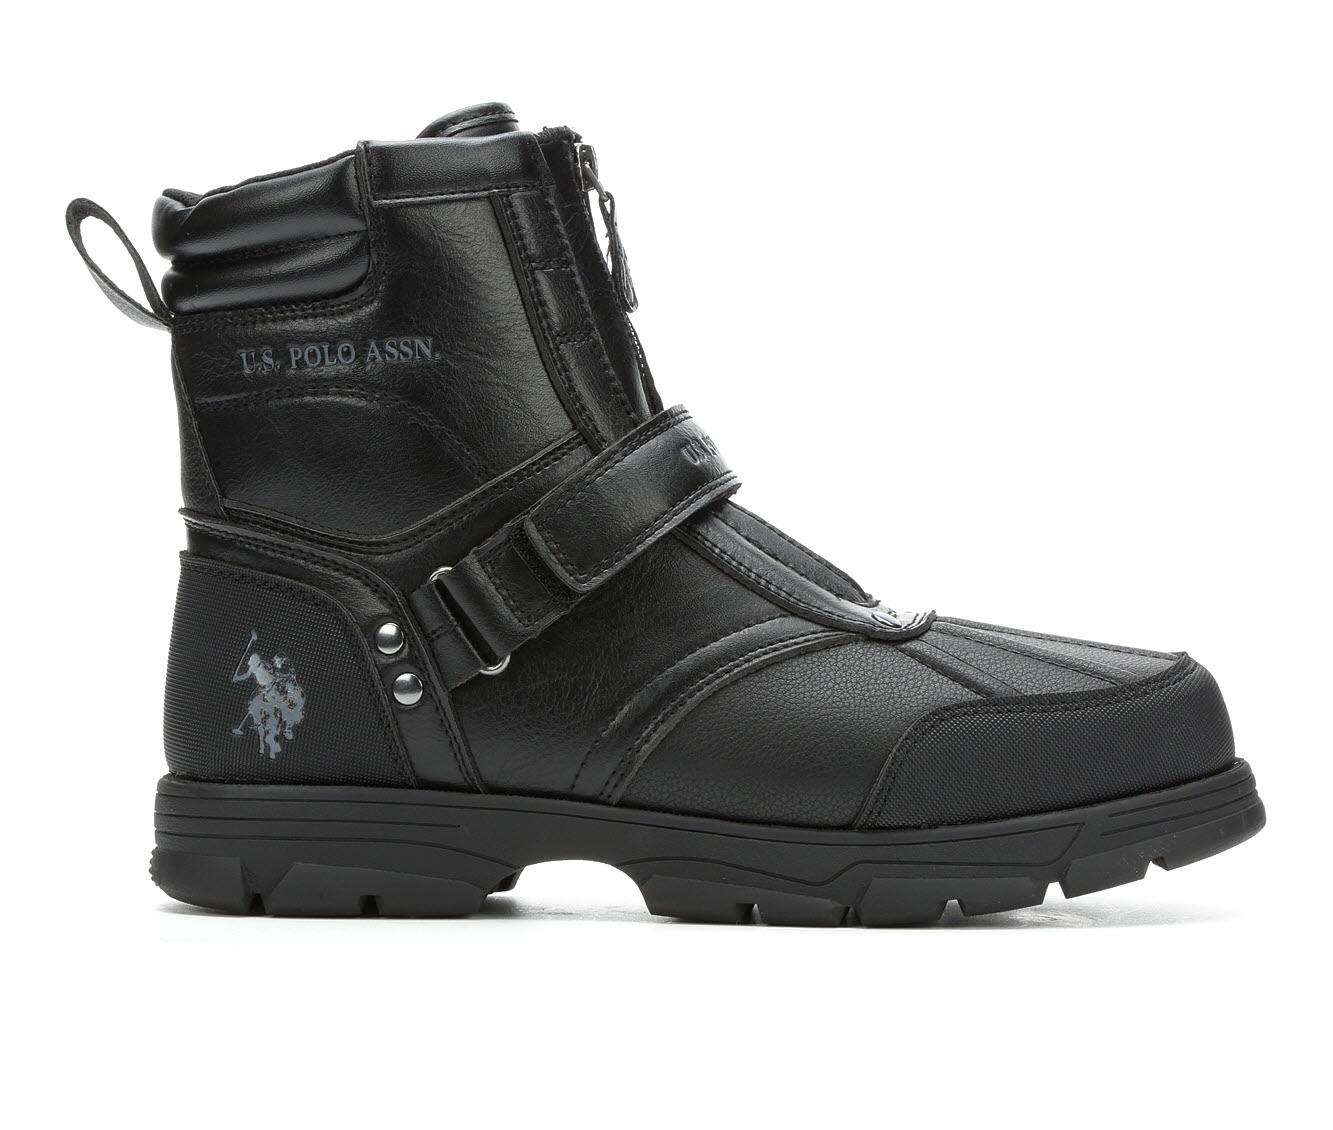 US Polo Assn Fairfield Men's Boots (Black Faux Leather)